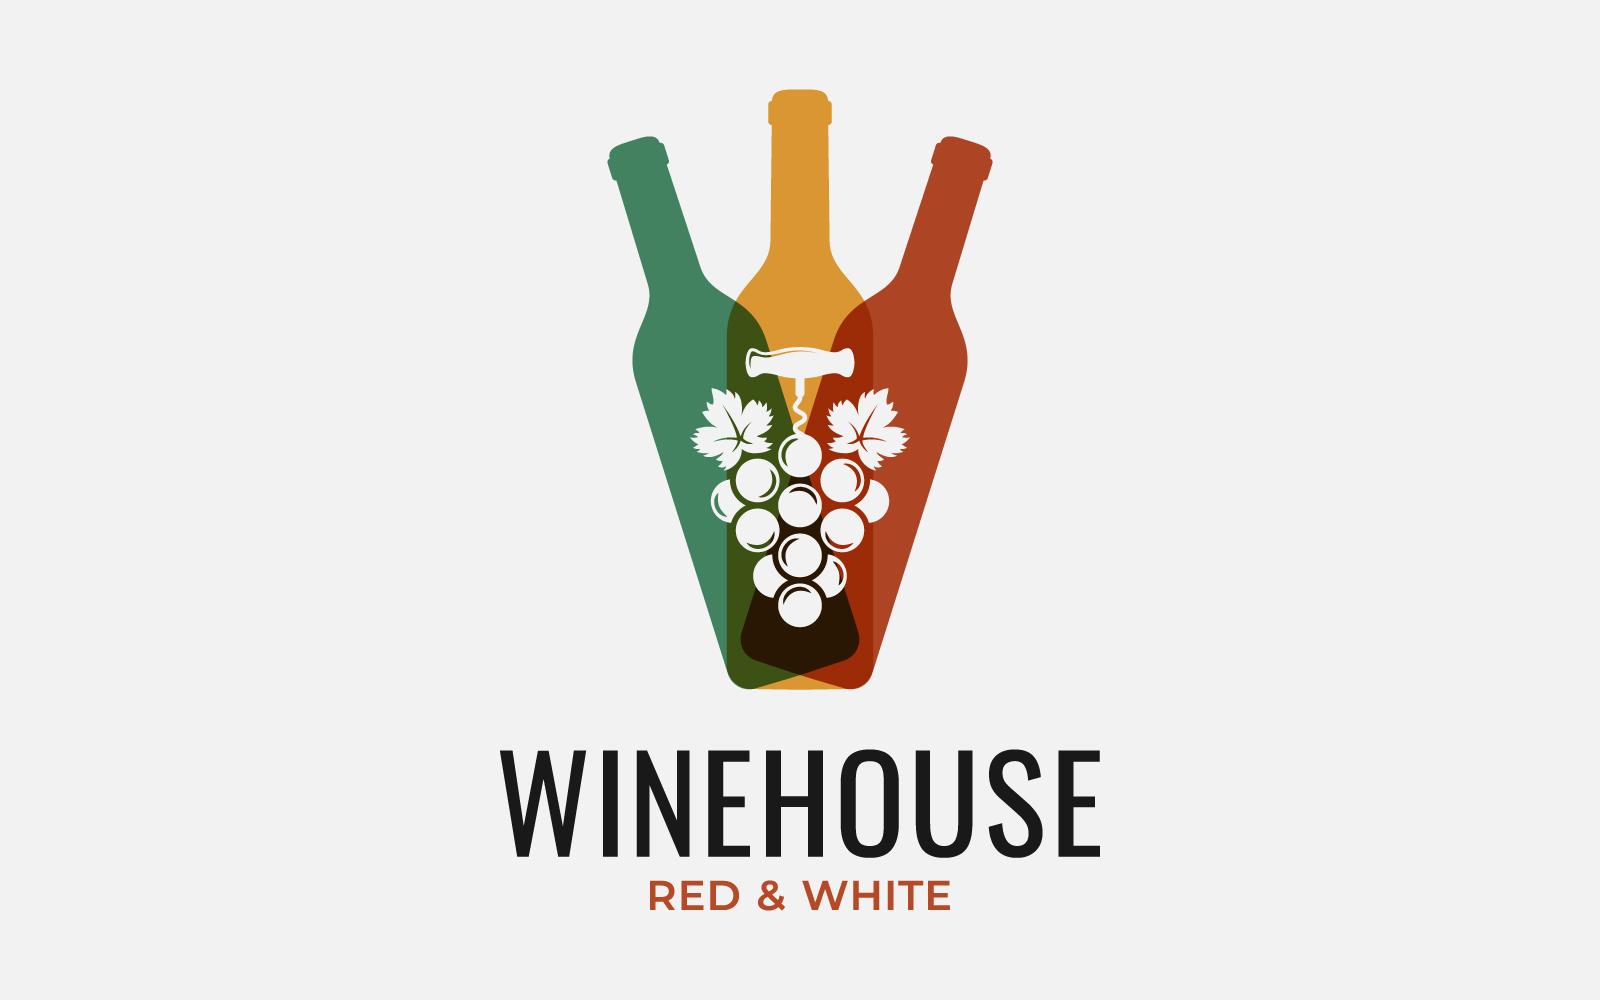 WIne Bottles. Wine Grapes. Logo Template